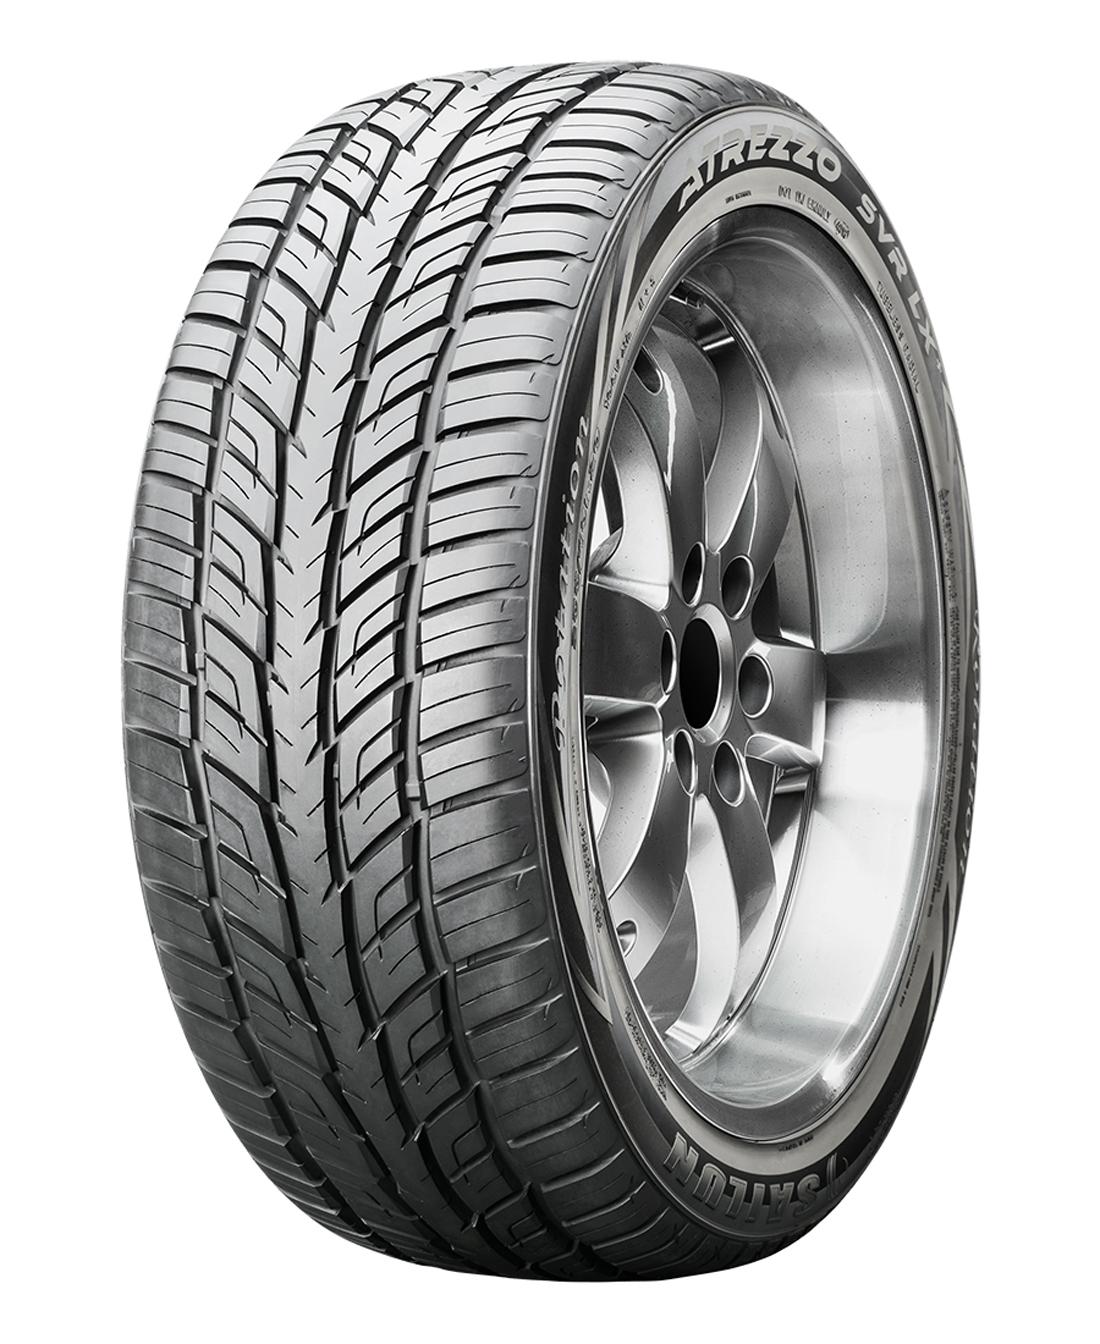 Sailun Tires Atrezzo SVR LX+ Passenger All Season Tire - 295/35R24XL 110V